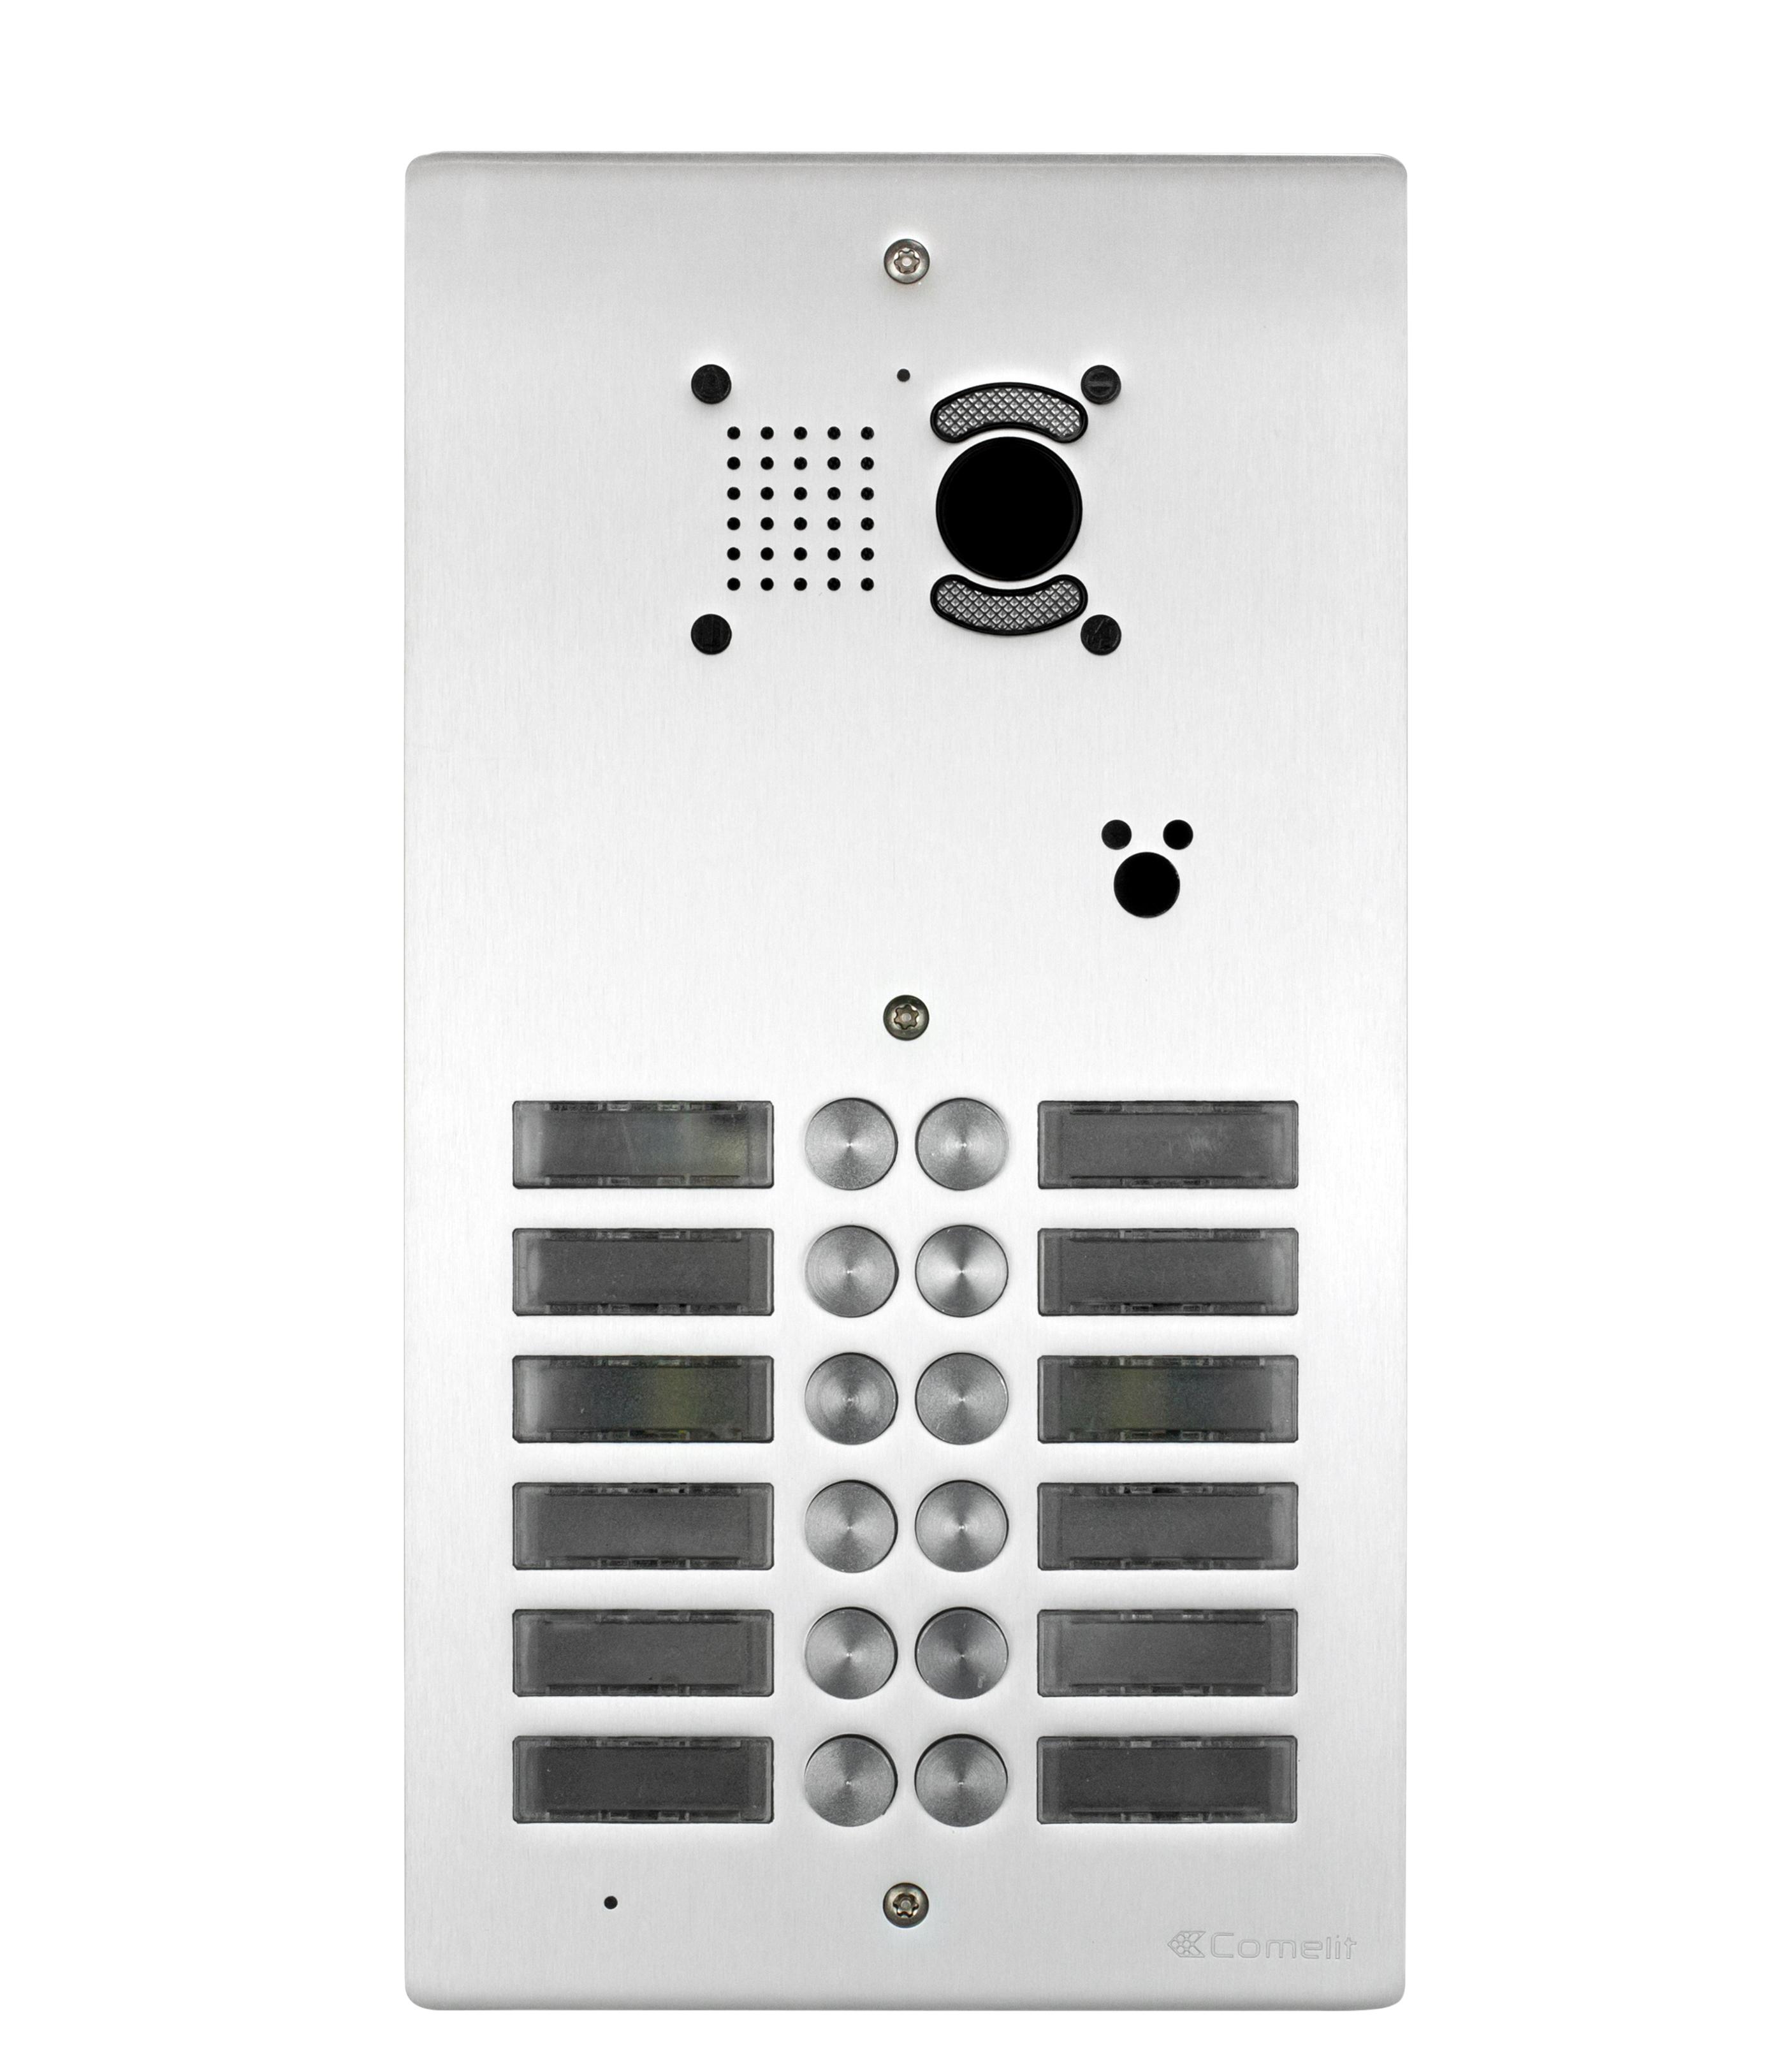 1 Stk AV-Panel Video, 12 Tasten, mit Postschloss-Ausschnitt, Alu SP3012NVPT